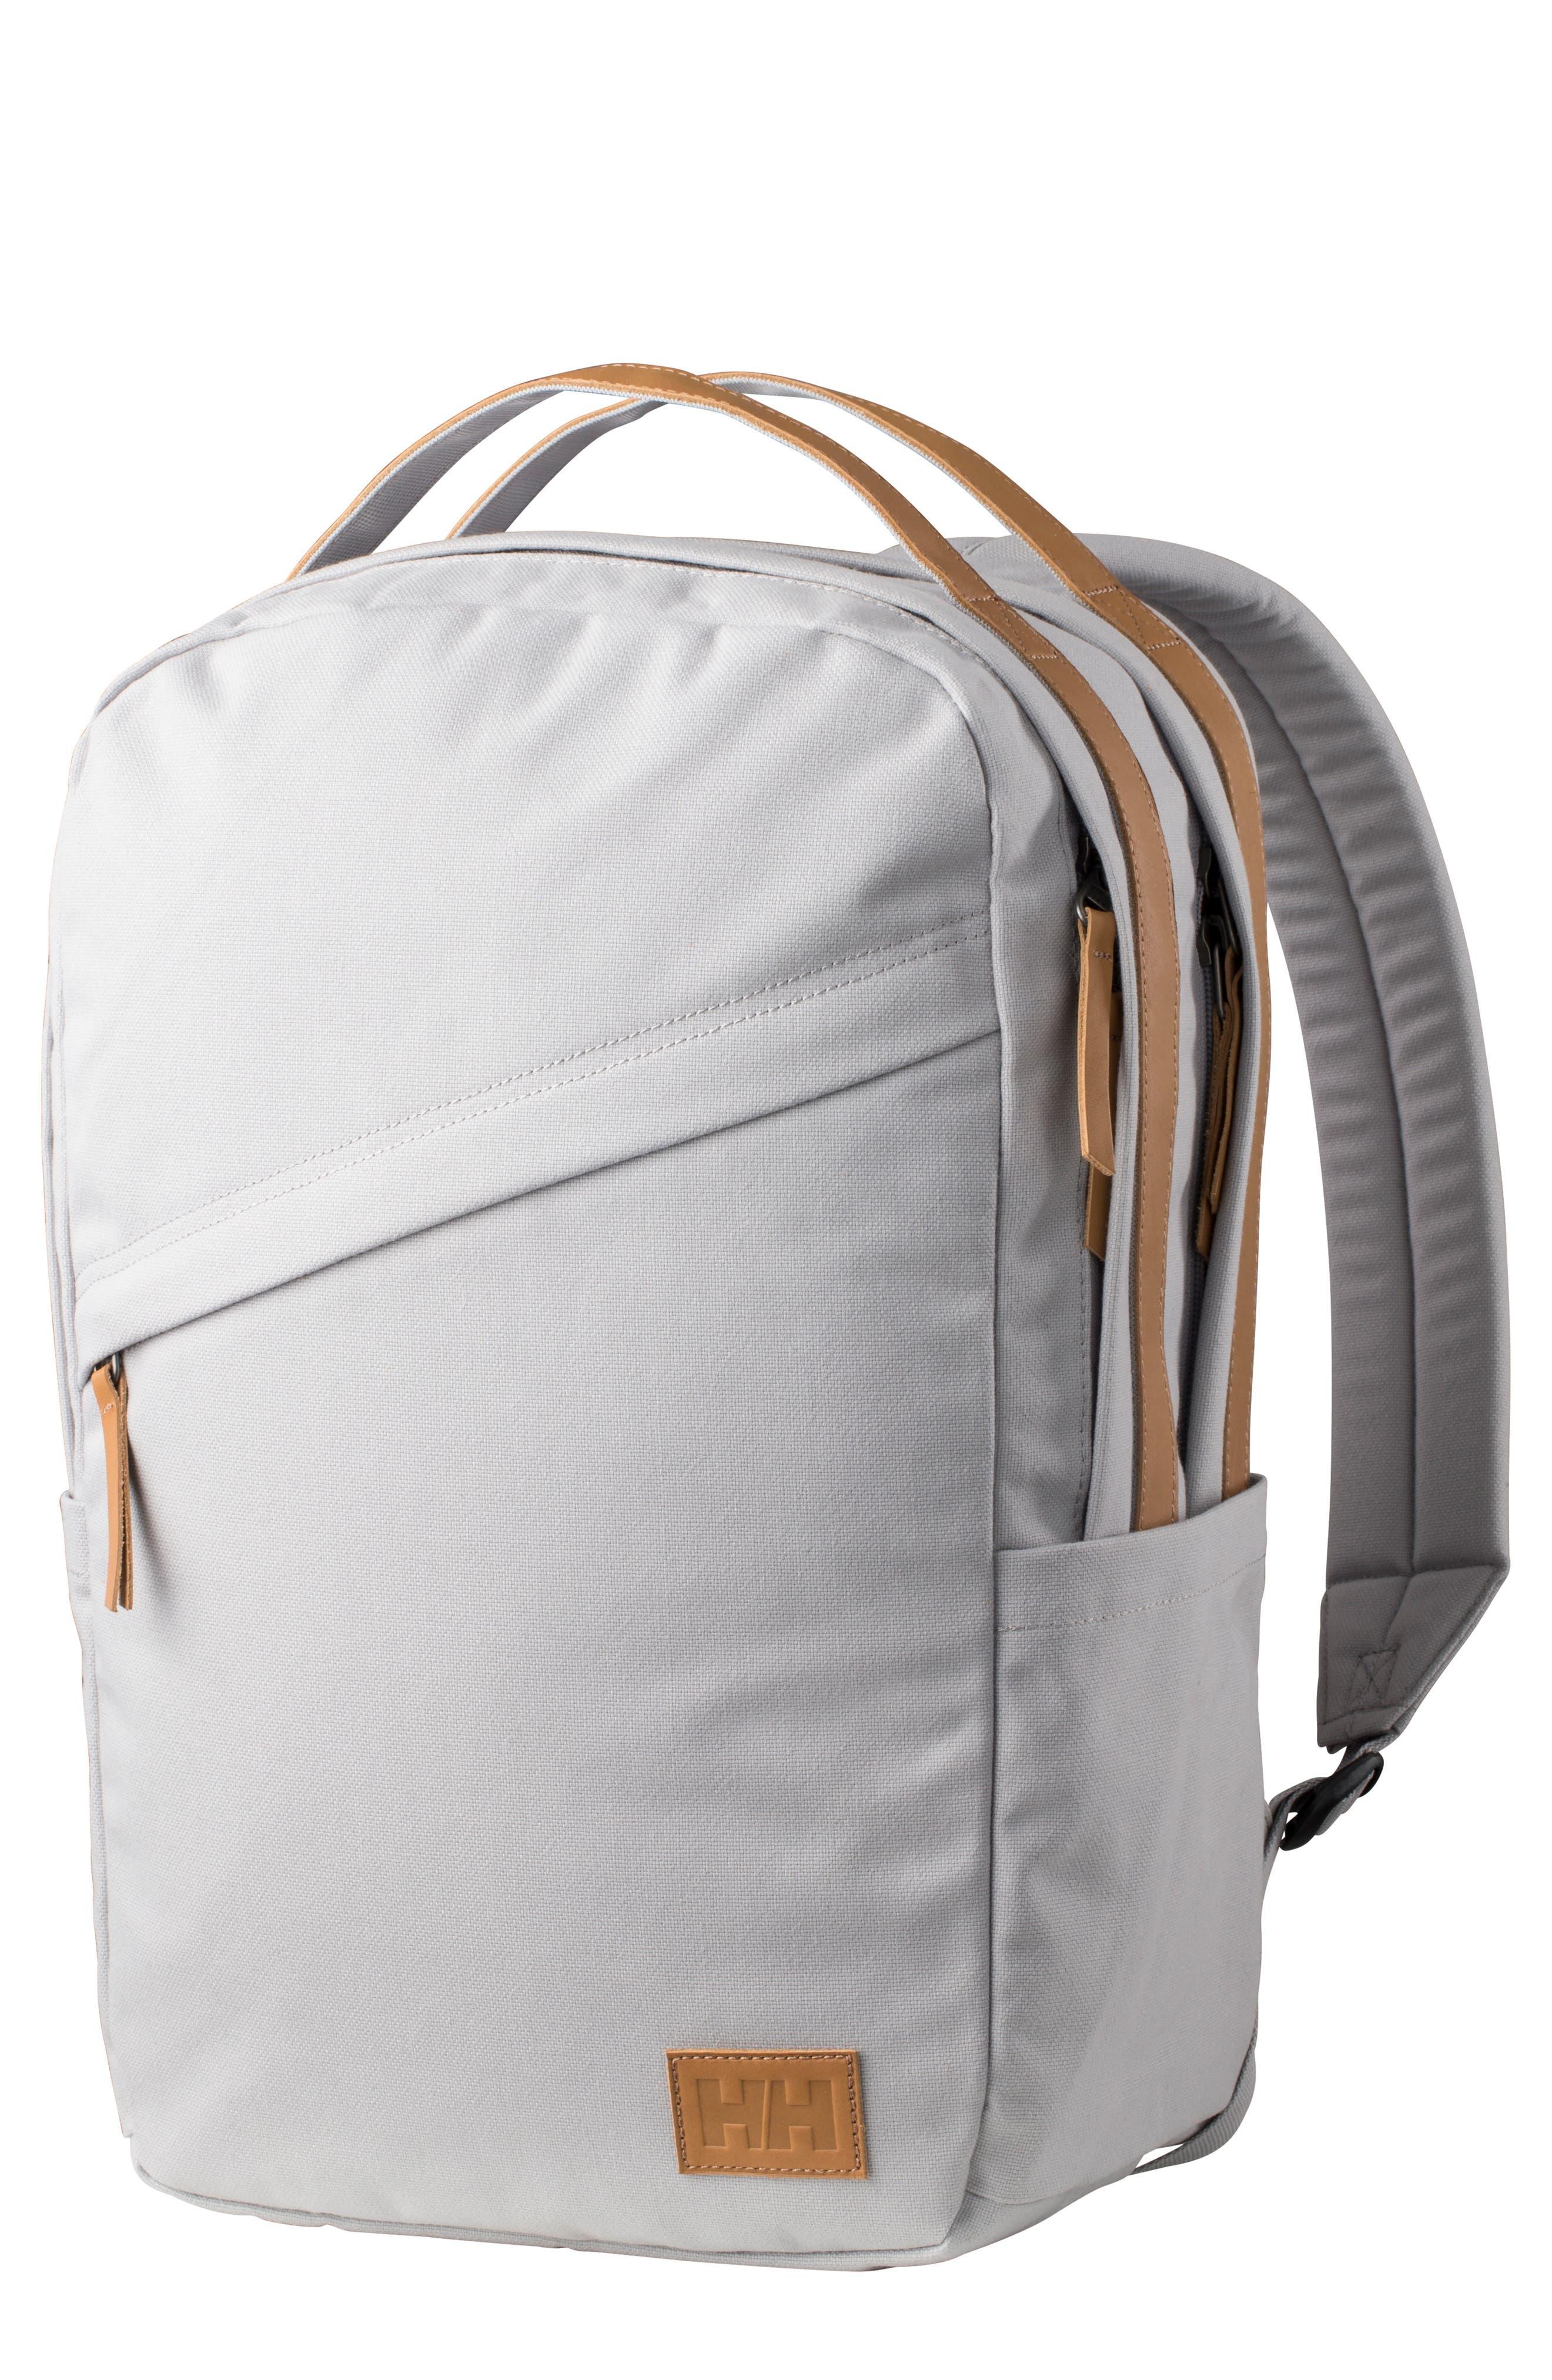 Copenhagen Backpack,                         Main,                         color, SILVER GREY